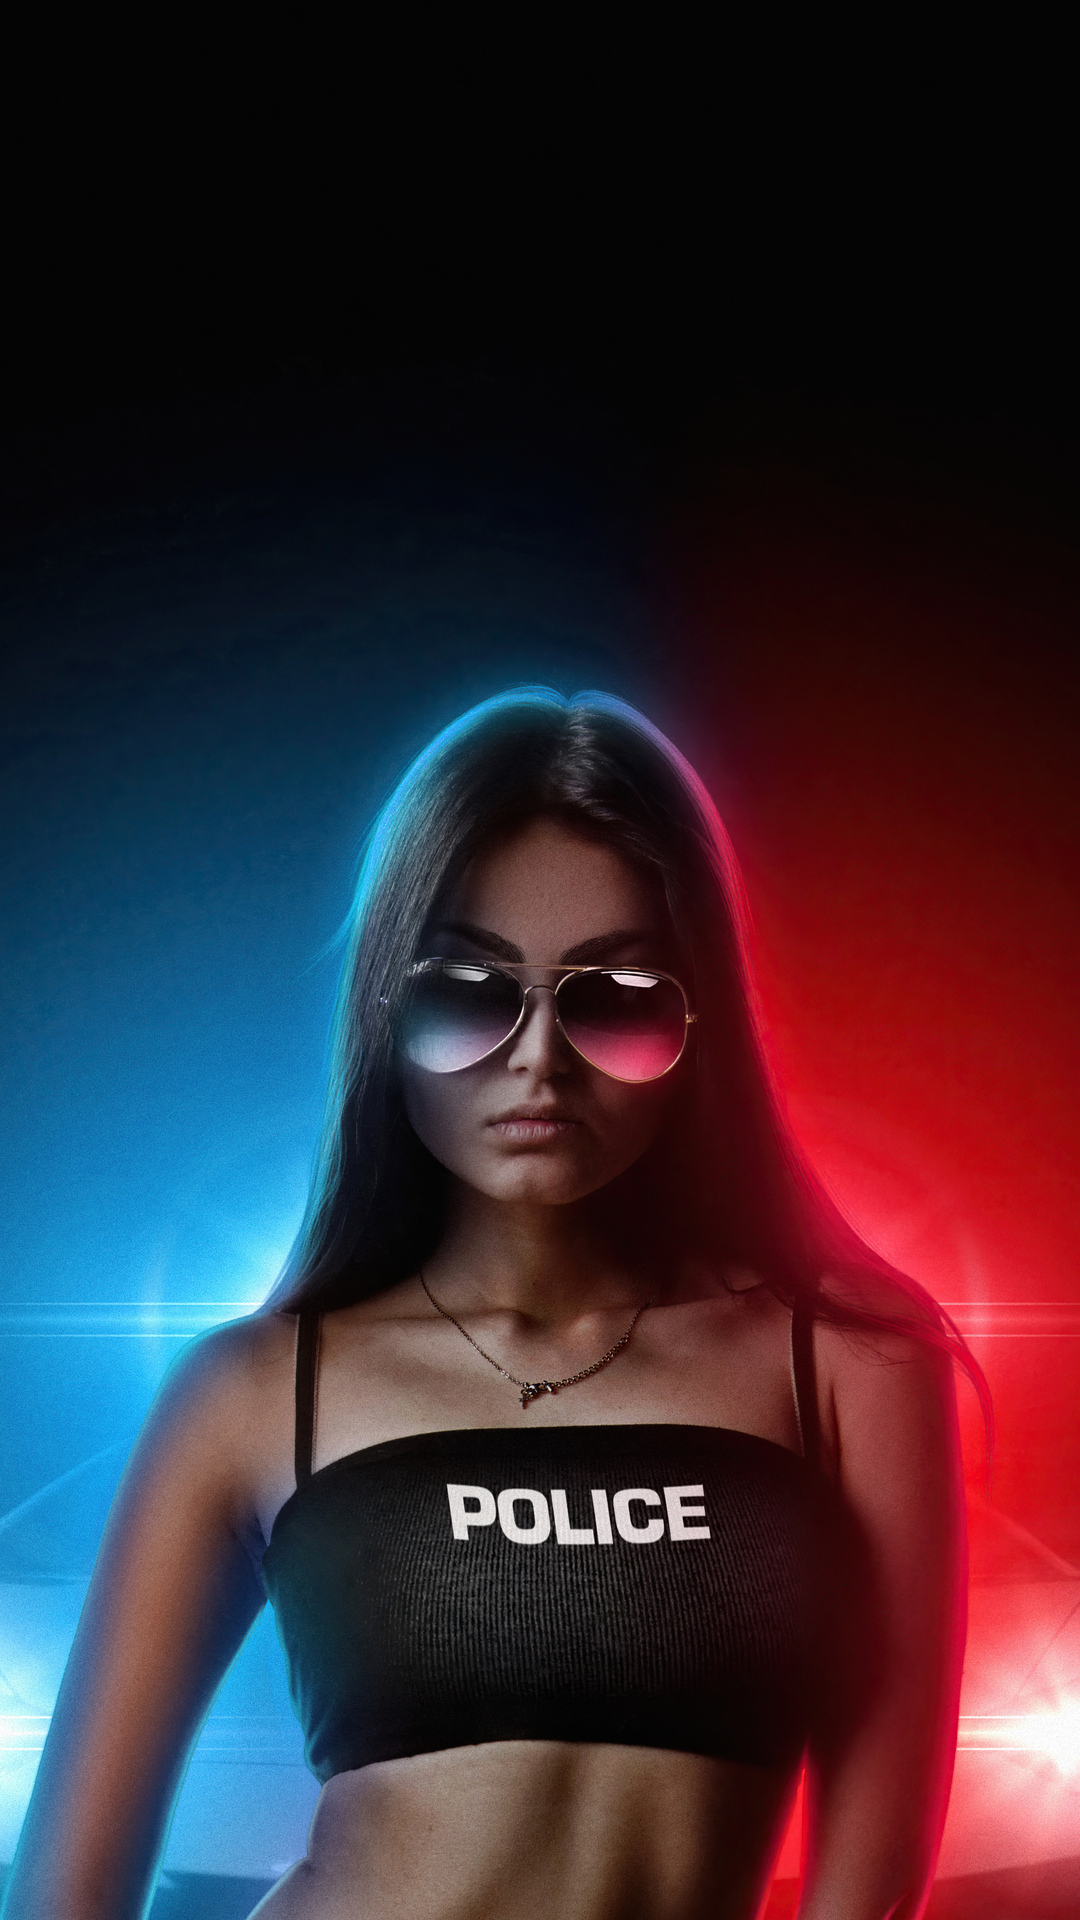 police-girl-xq.jpg